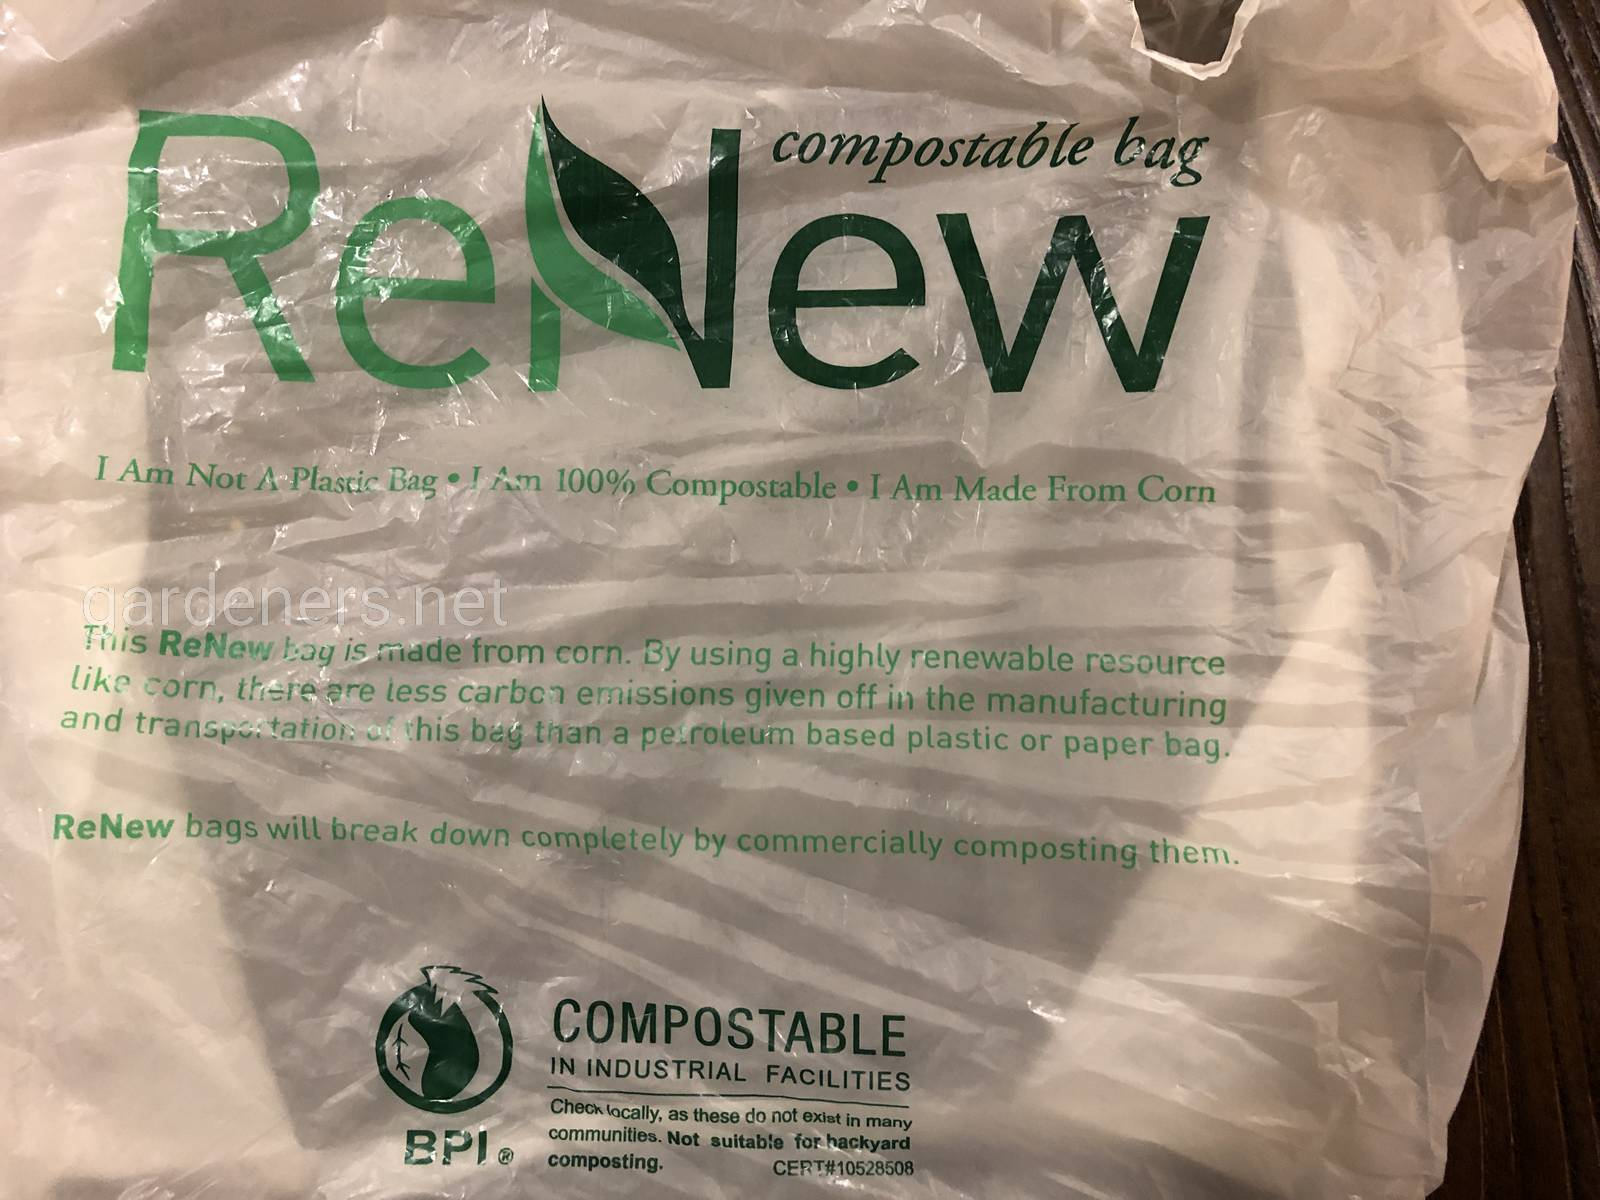 Compostable bag, NOT plastic